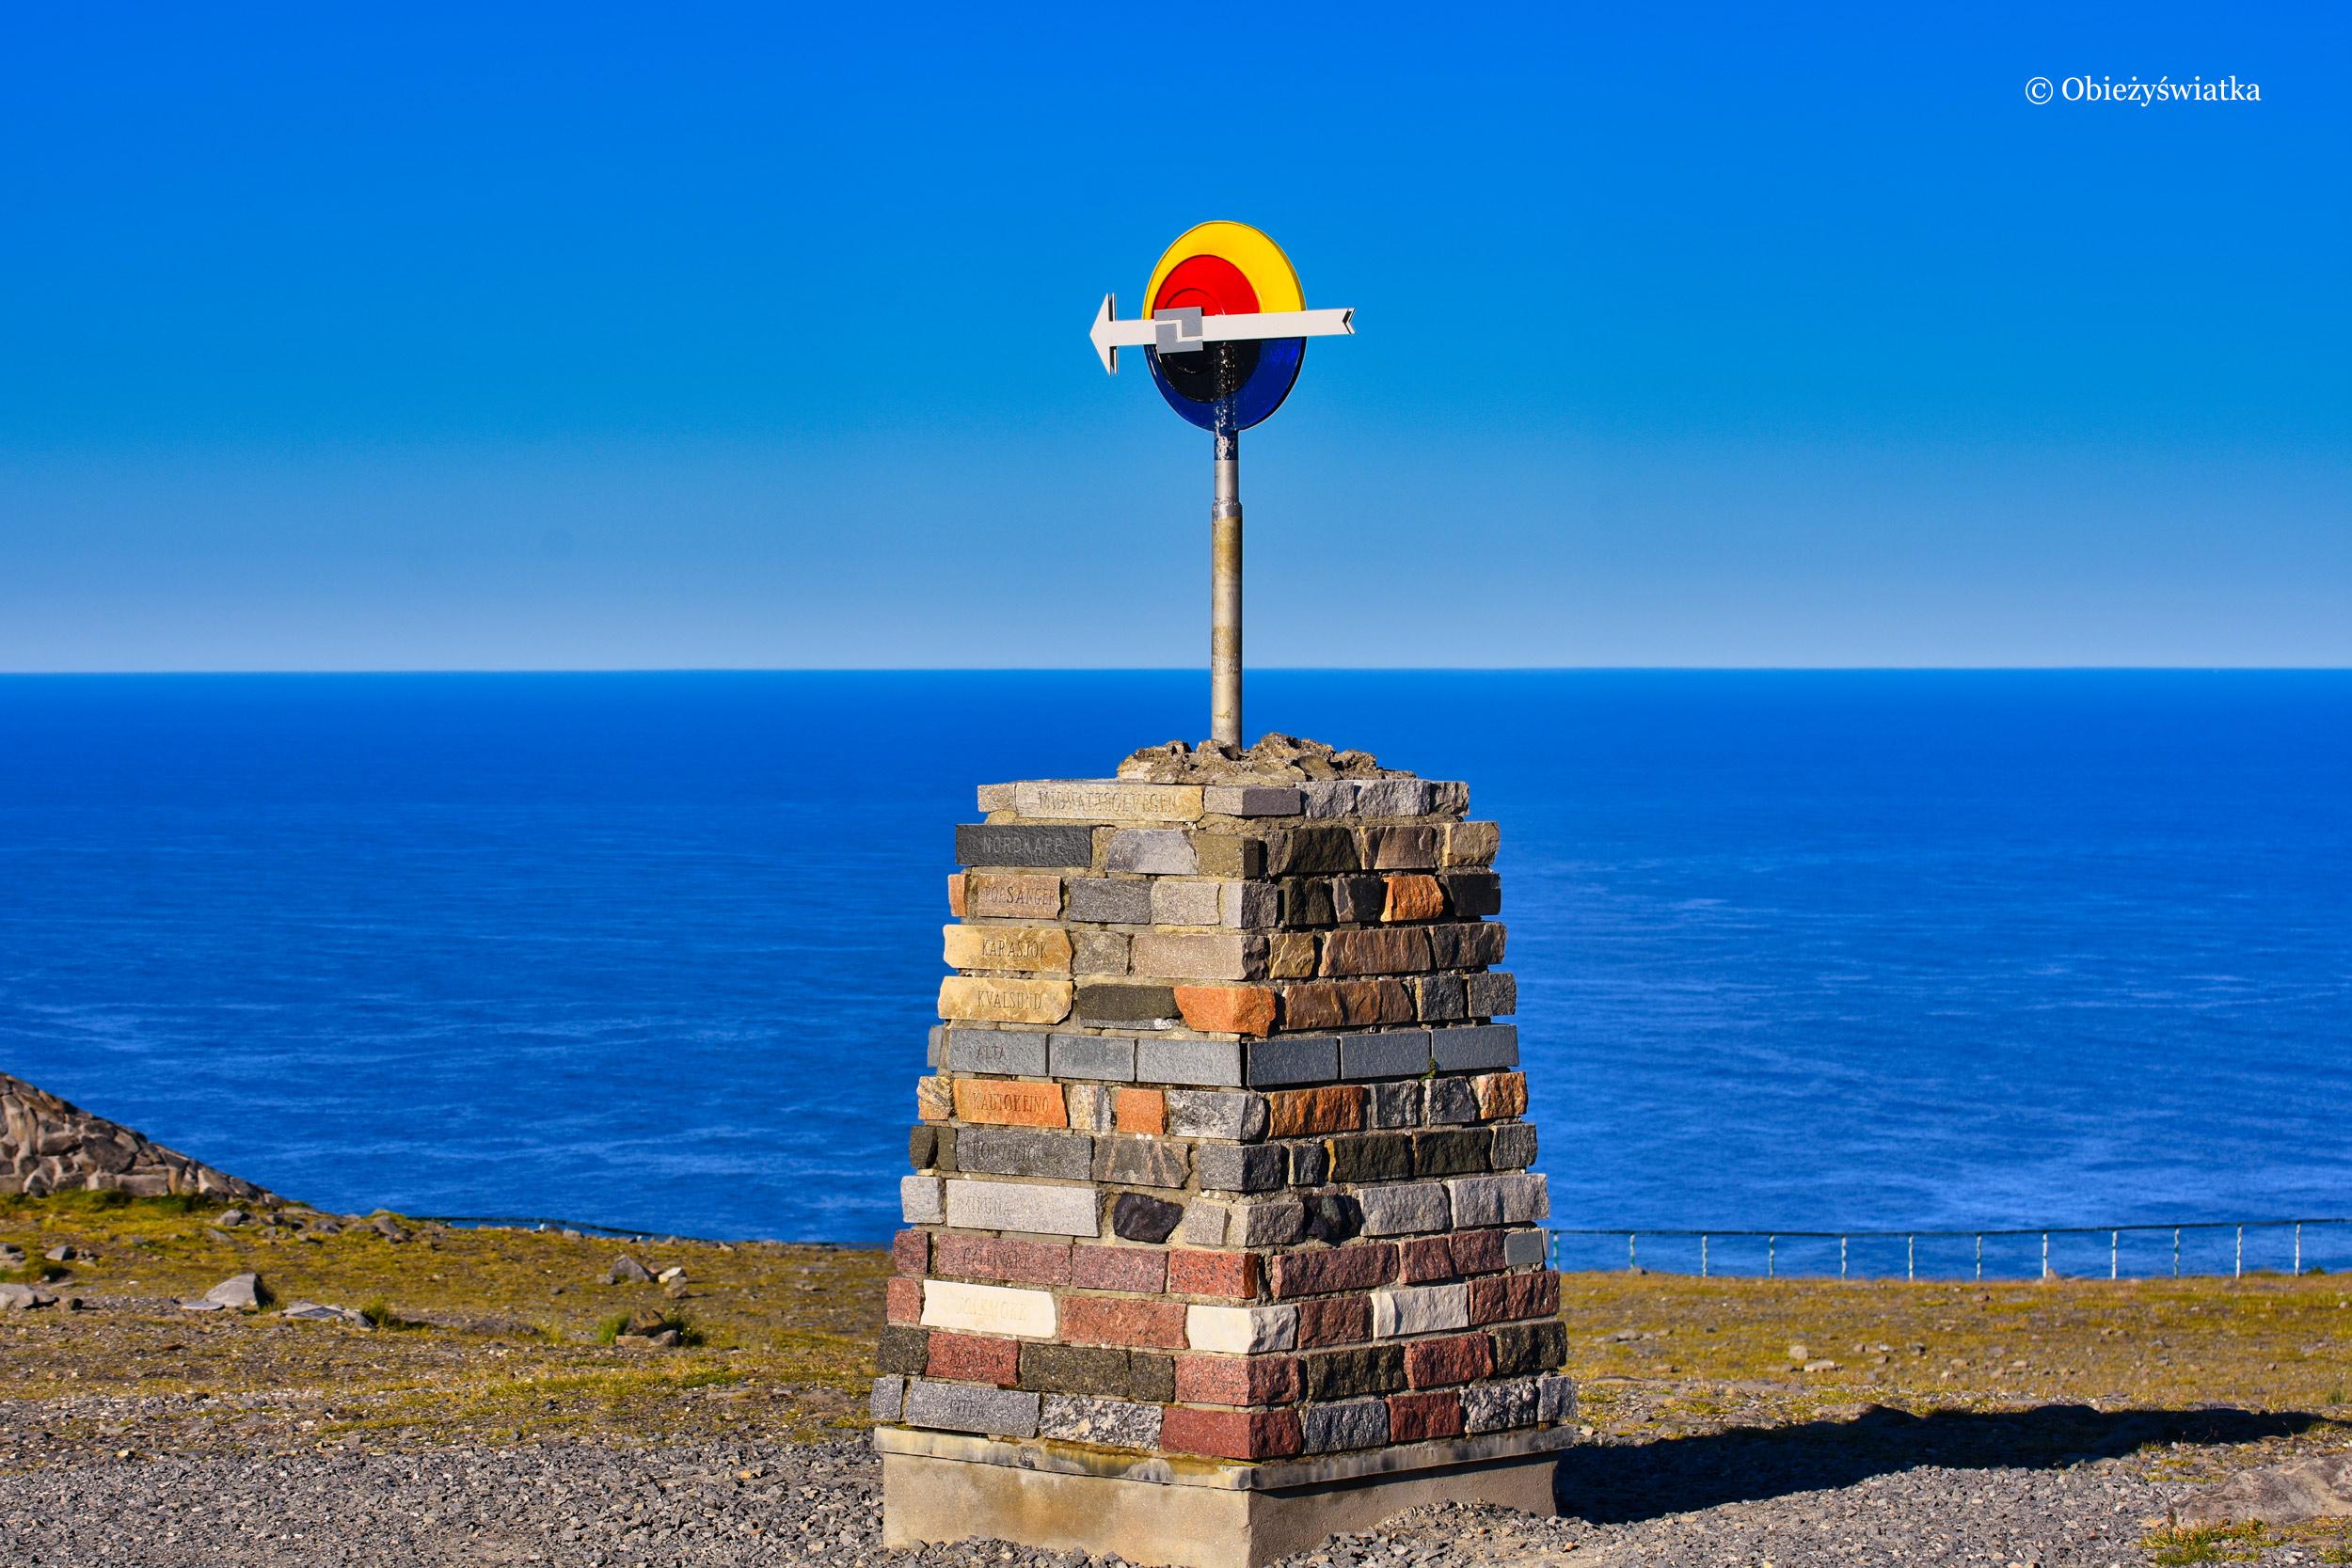 Nordkapp - Przylądek Północny, Norwegia